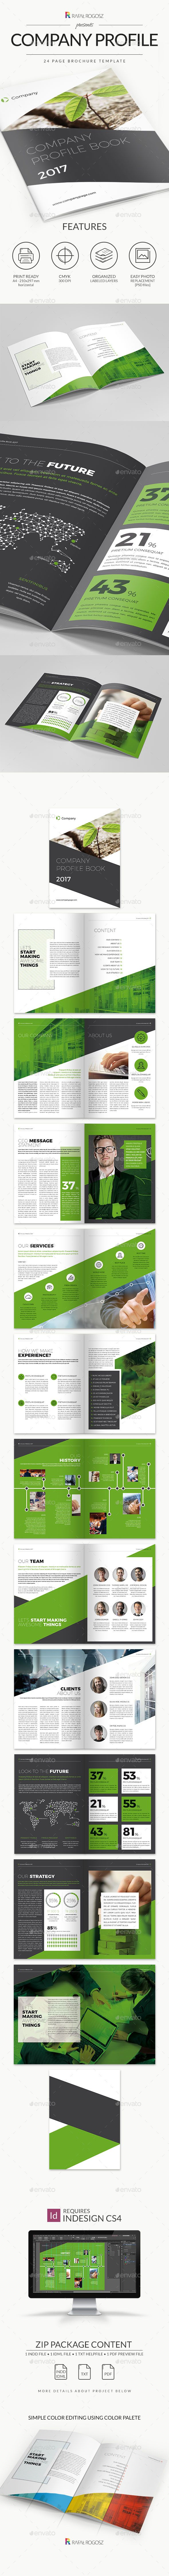 Company Profile brochure 2017 — Photoshop PSD #portfolio #design • Download ➝ https://graphicriver.net/item/company-profile-brochure-2017/18823239?ref=pxcr